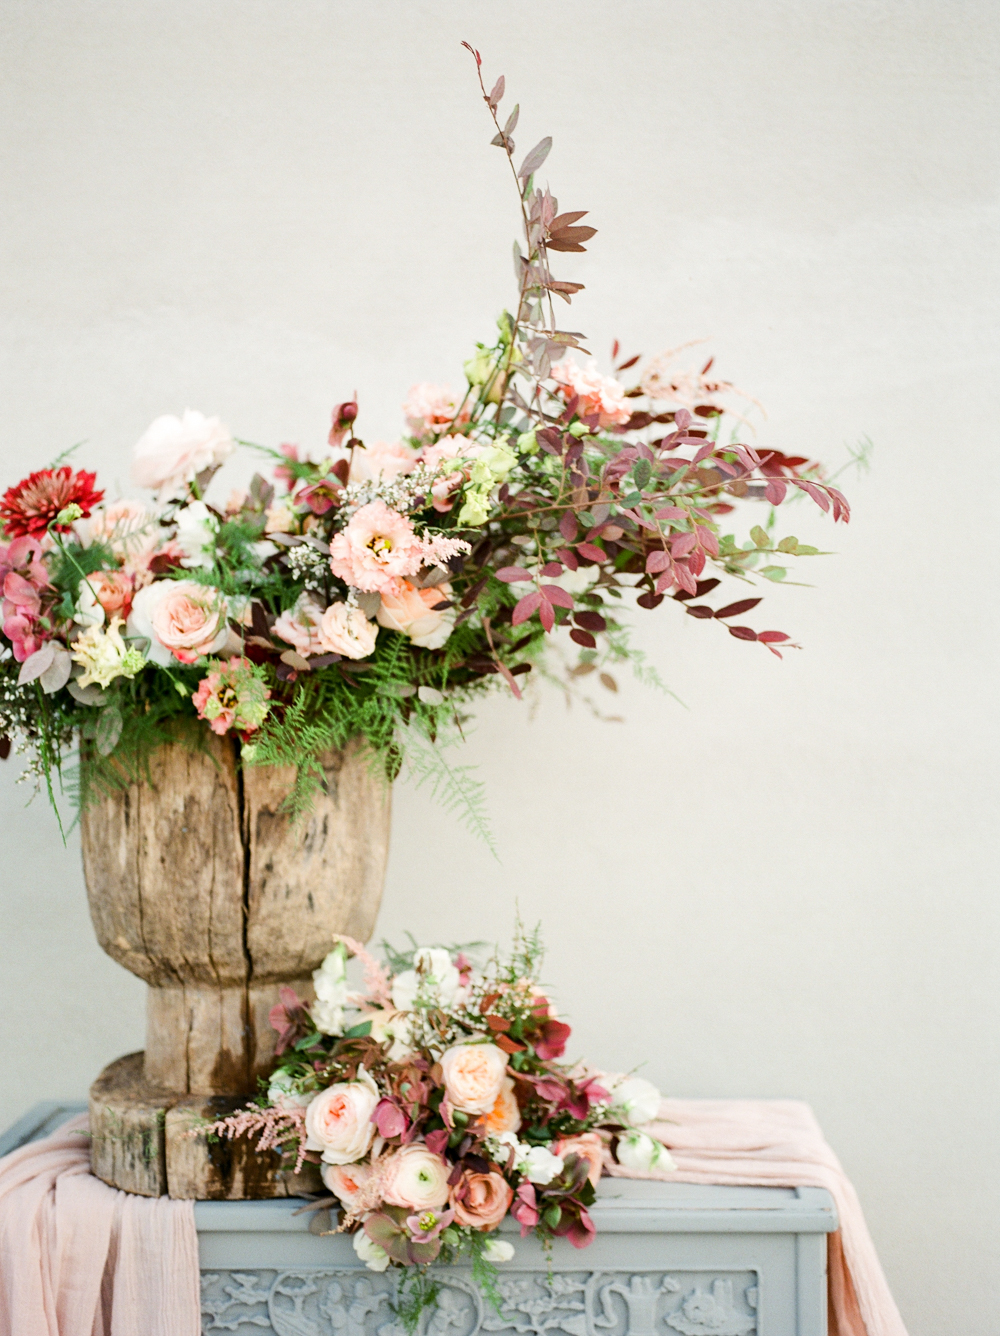 A lovely houston bride_wedding_Christine Gosch_www.christinegosch.com_Houston, TX-5.jpg